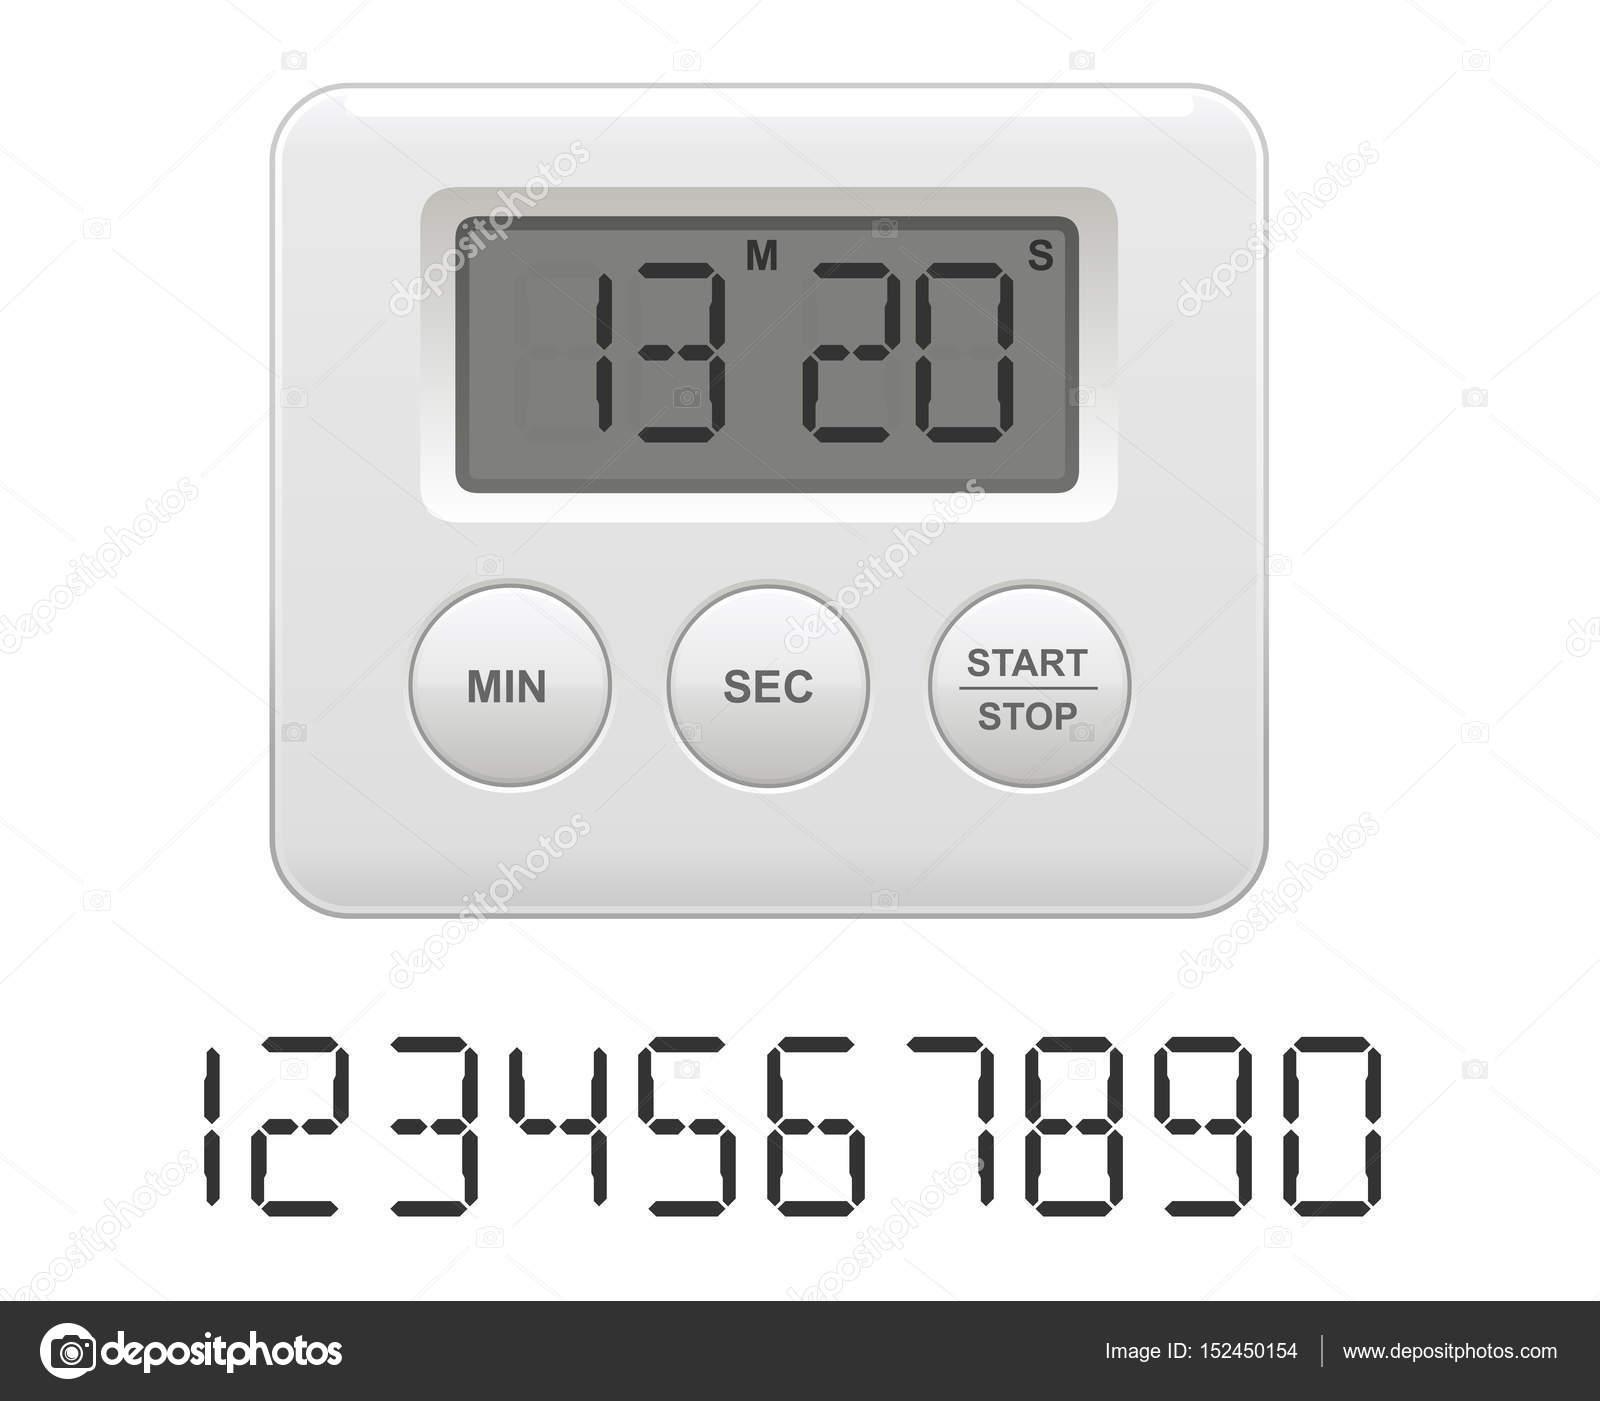 digital kitchen timers light fixtures flush mount 矢量图的数字厨房计时器 图库矢量图像 c blackpencil 152450154 图库矢量图片